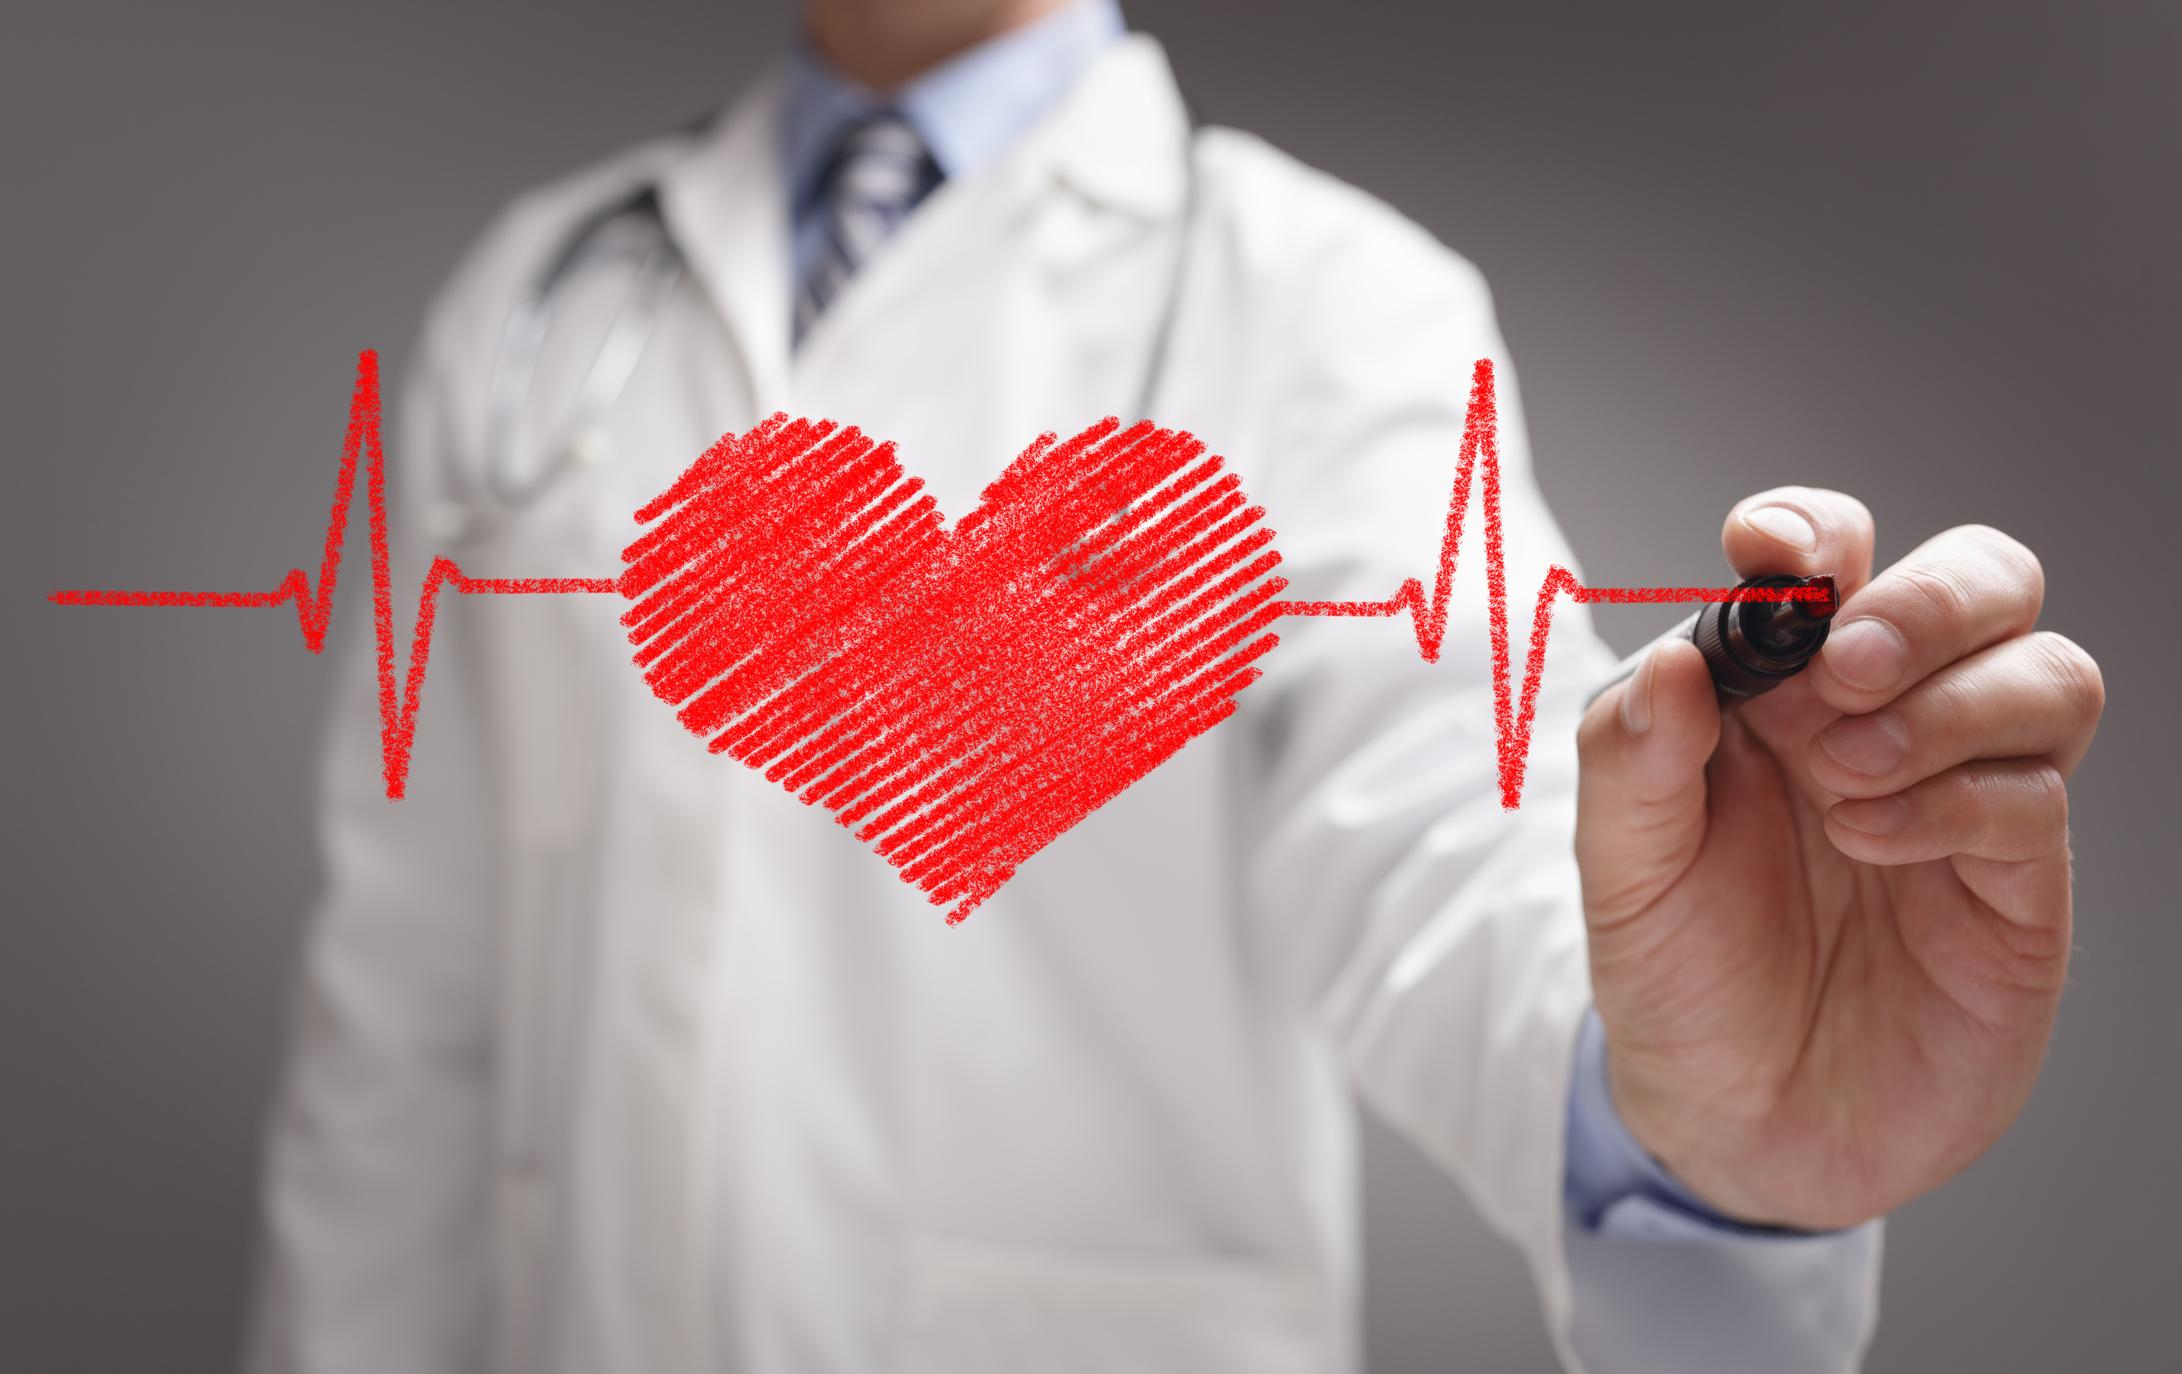 Hospitals / Health Care